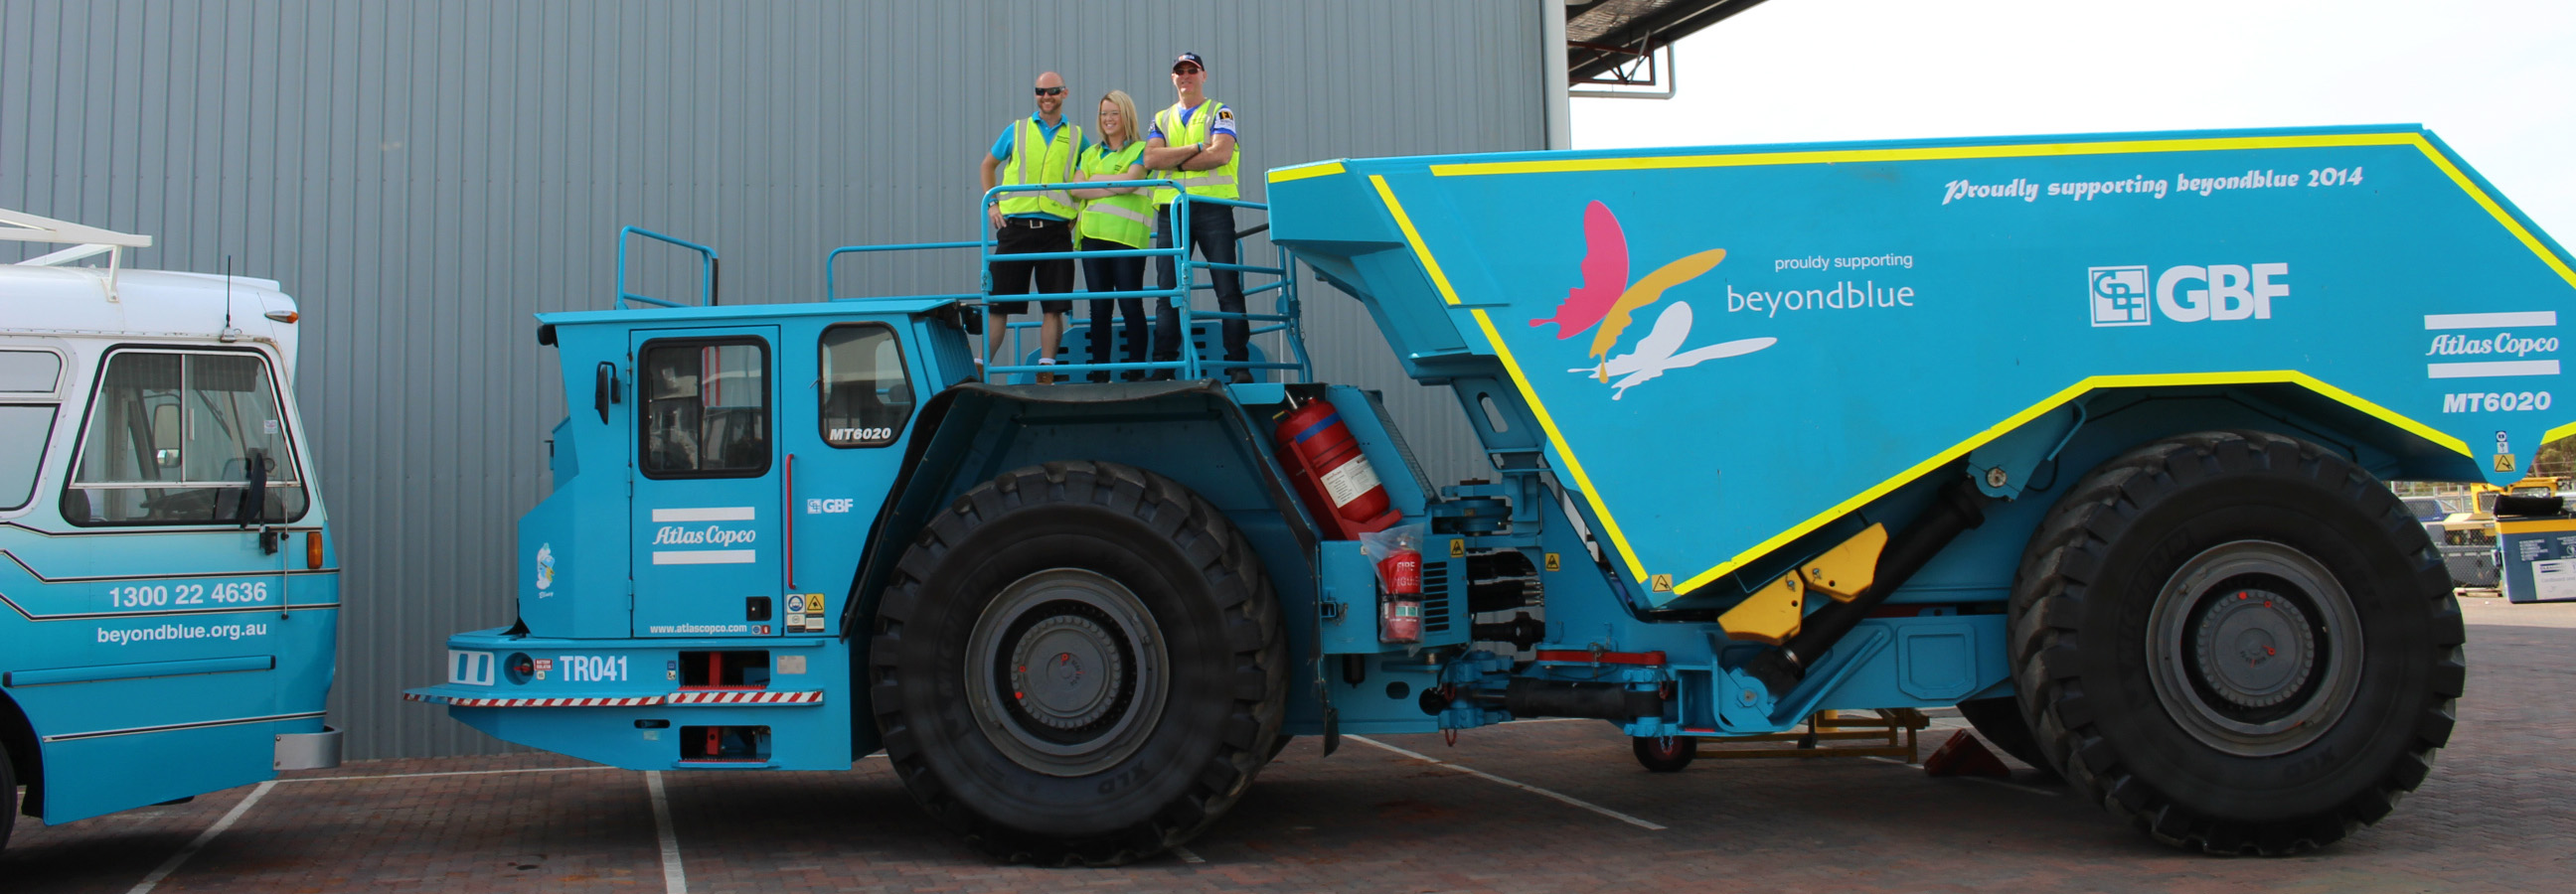 Roadshow Rhonda met GBF Underground Mining's Papa Smurf in Kalgoorlie!